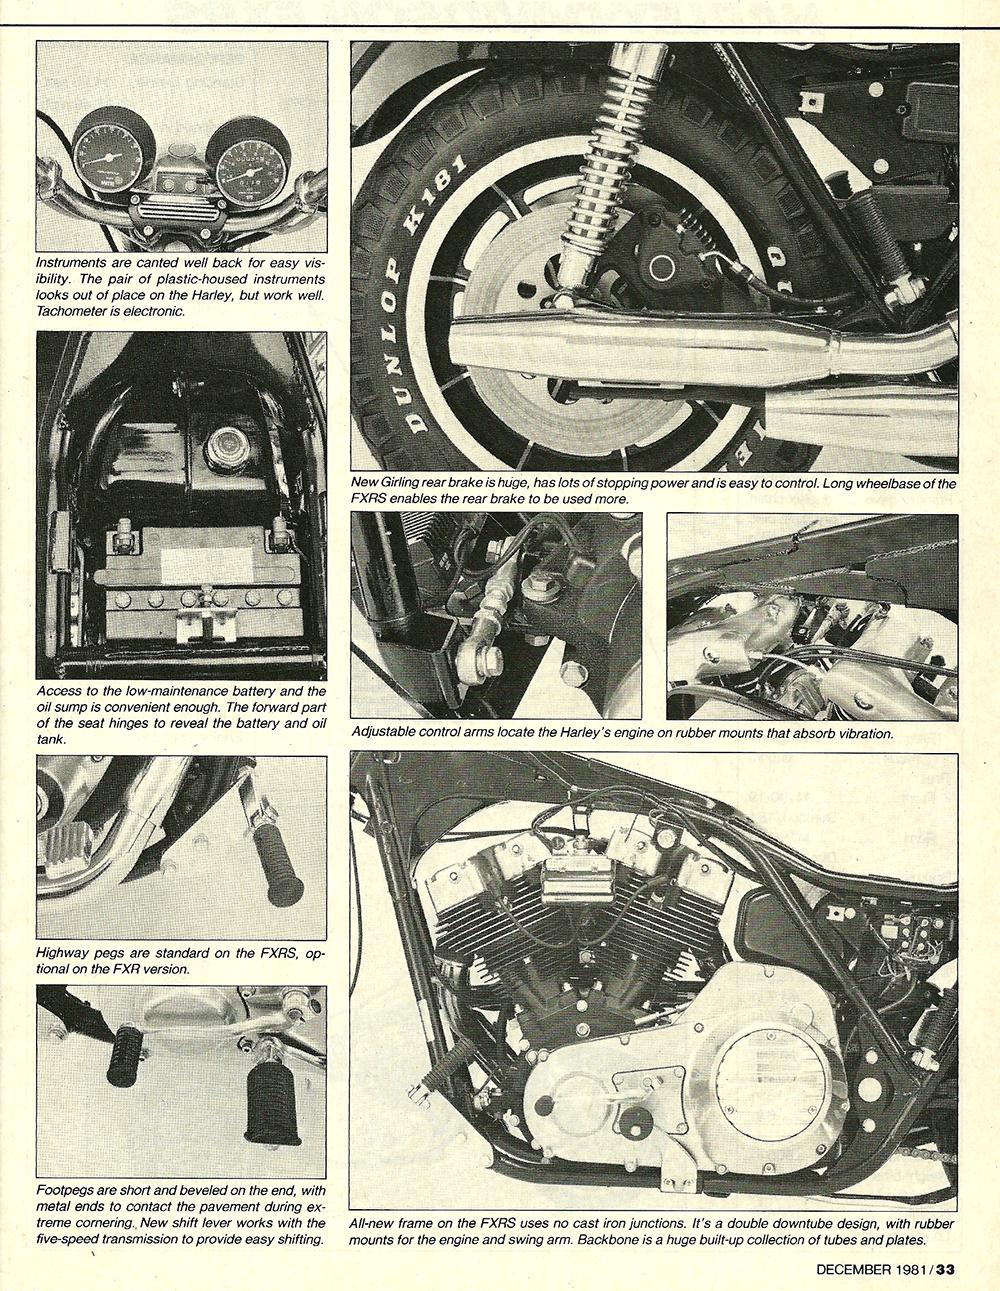 1981 Harley-Davidson FXRS road test 6.jpg